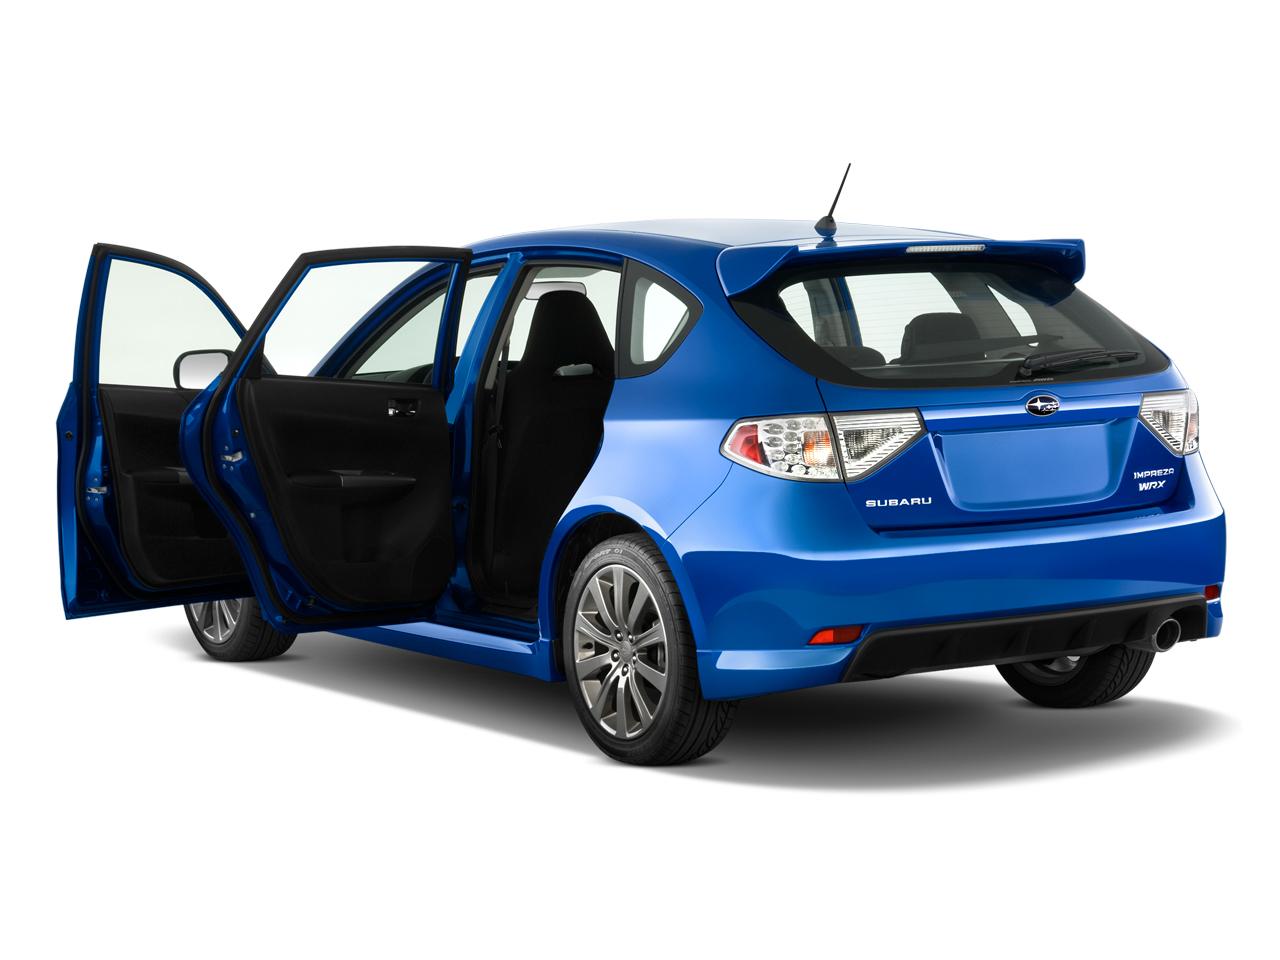 2010 subaru impreza wrx sti carbon 2009 tokyo auto show coverage new car reviews concept. Black Bedroom Furniture Sets. Home Design Ideas